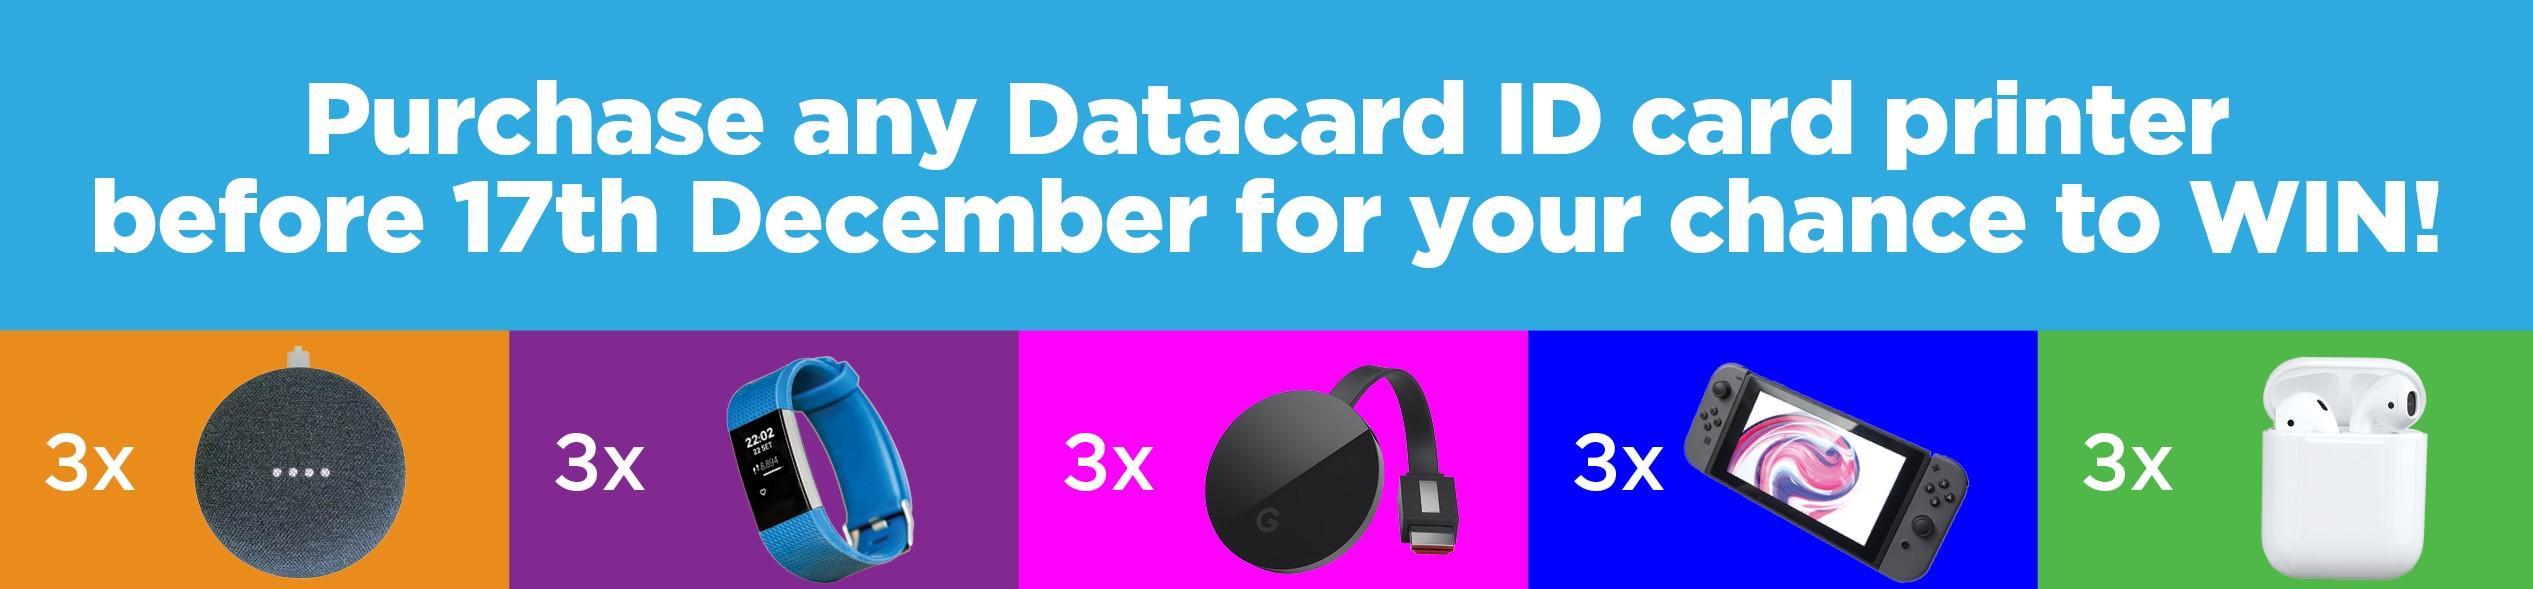 id_card_printer_prize_draw_2019